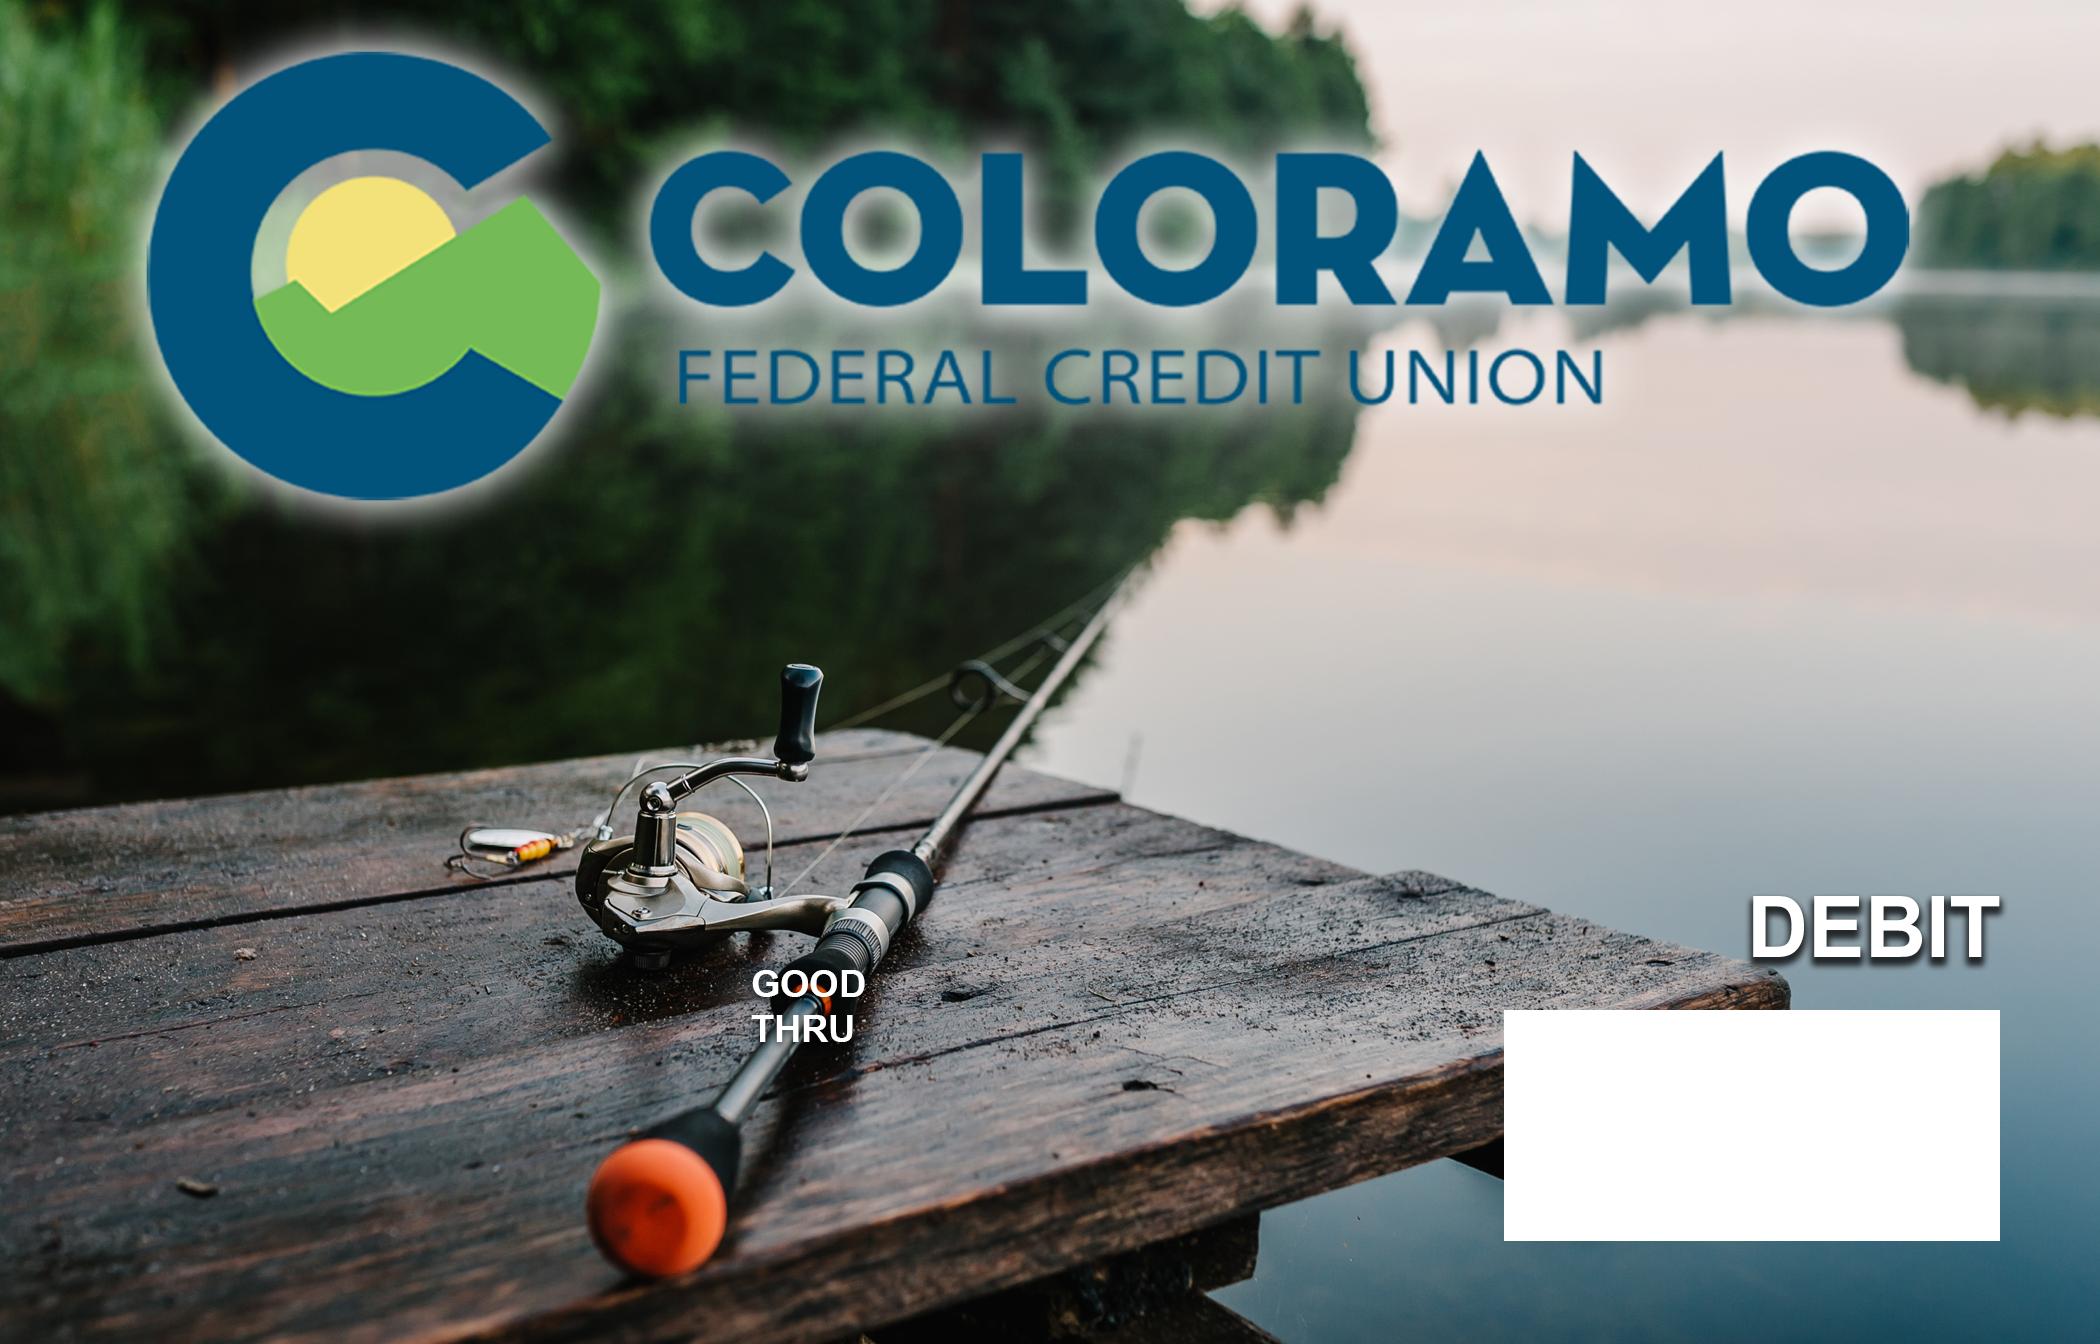 Coloramo Federal CU Debit Card Fishing.png